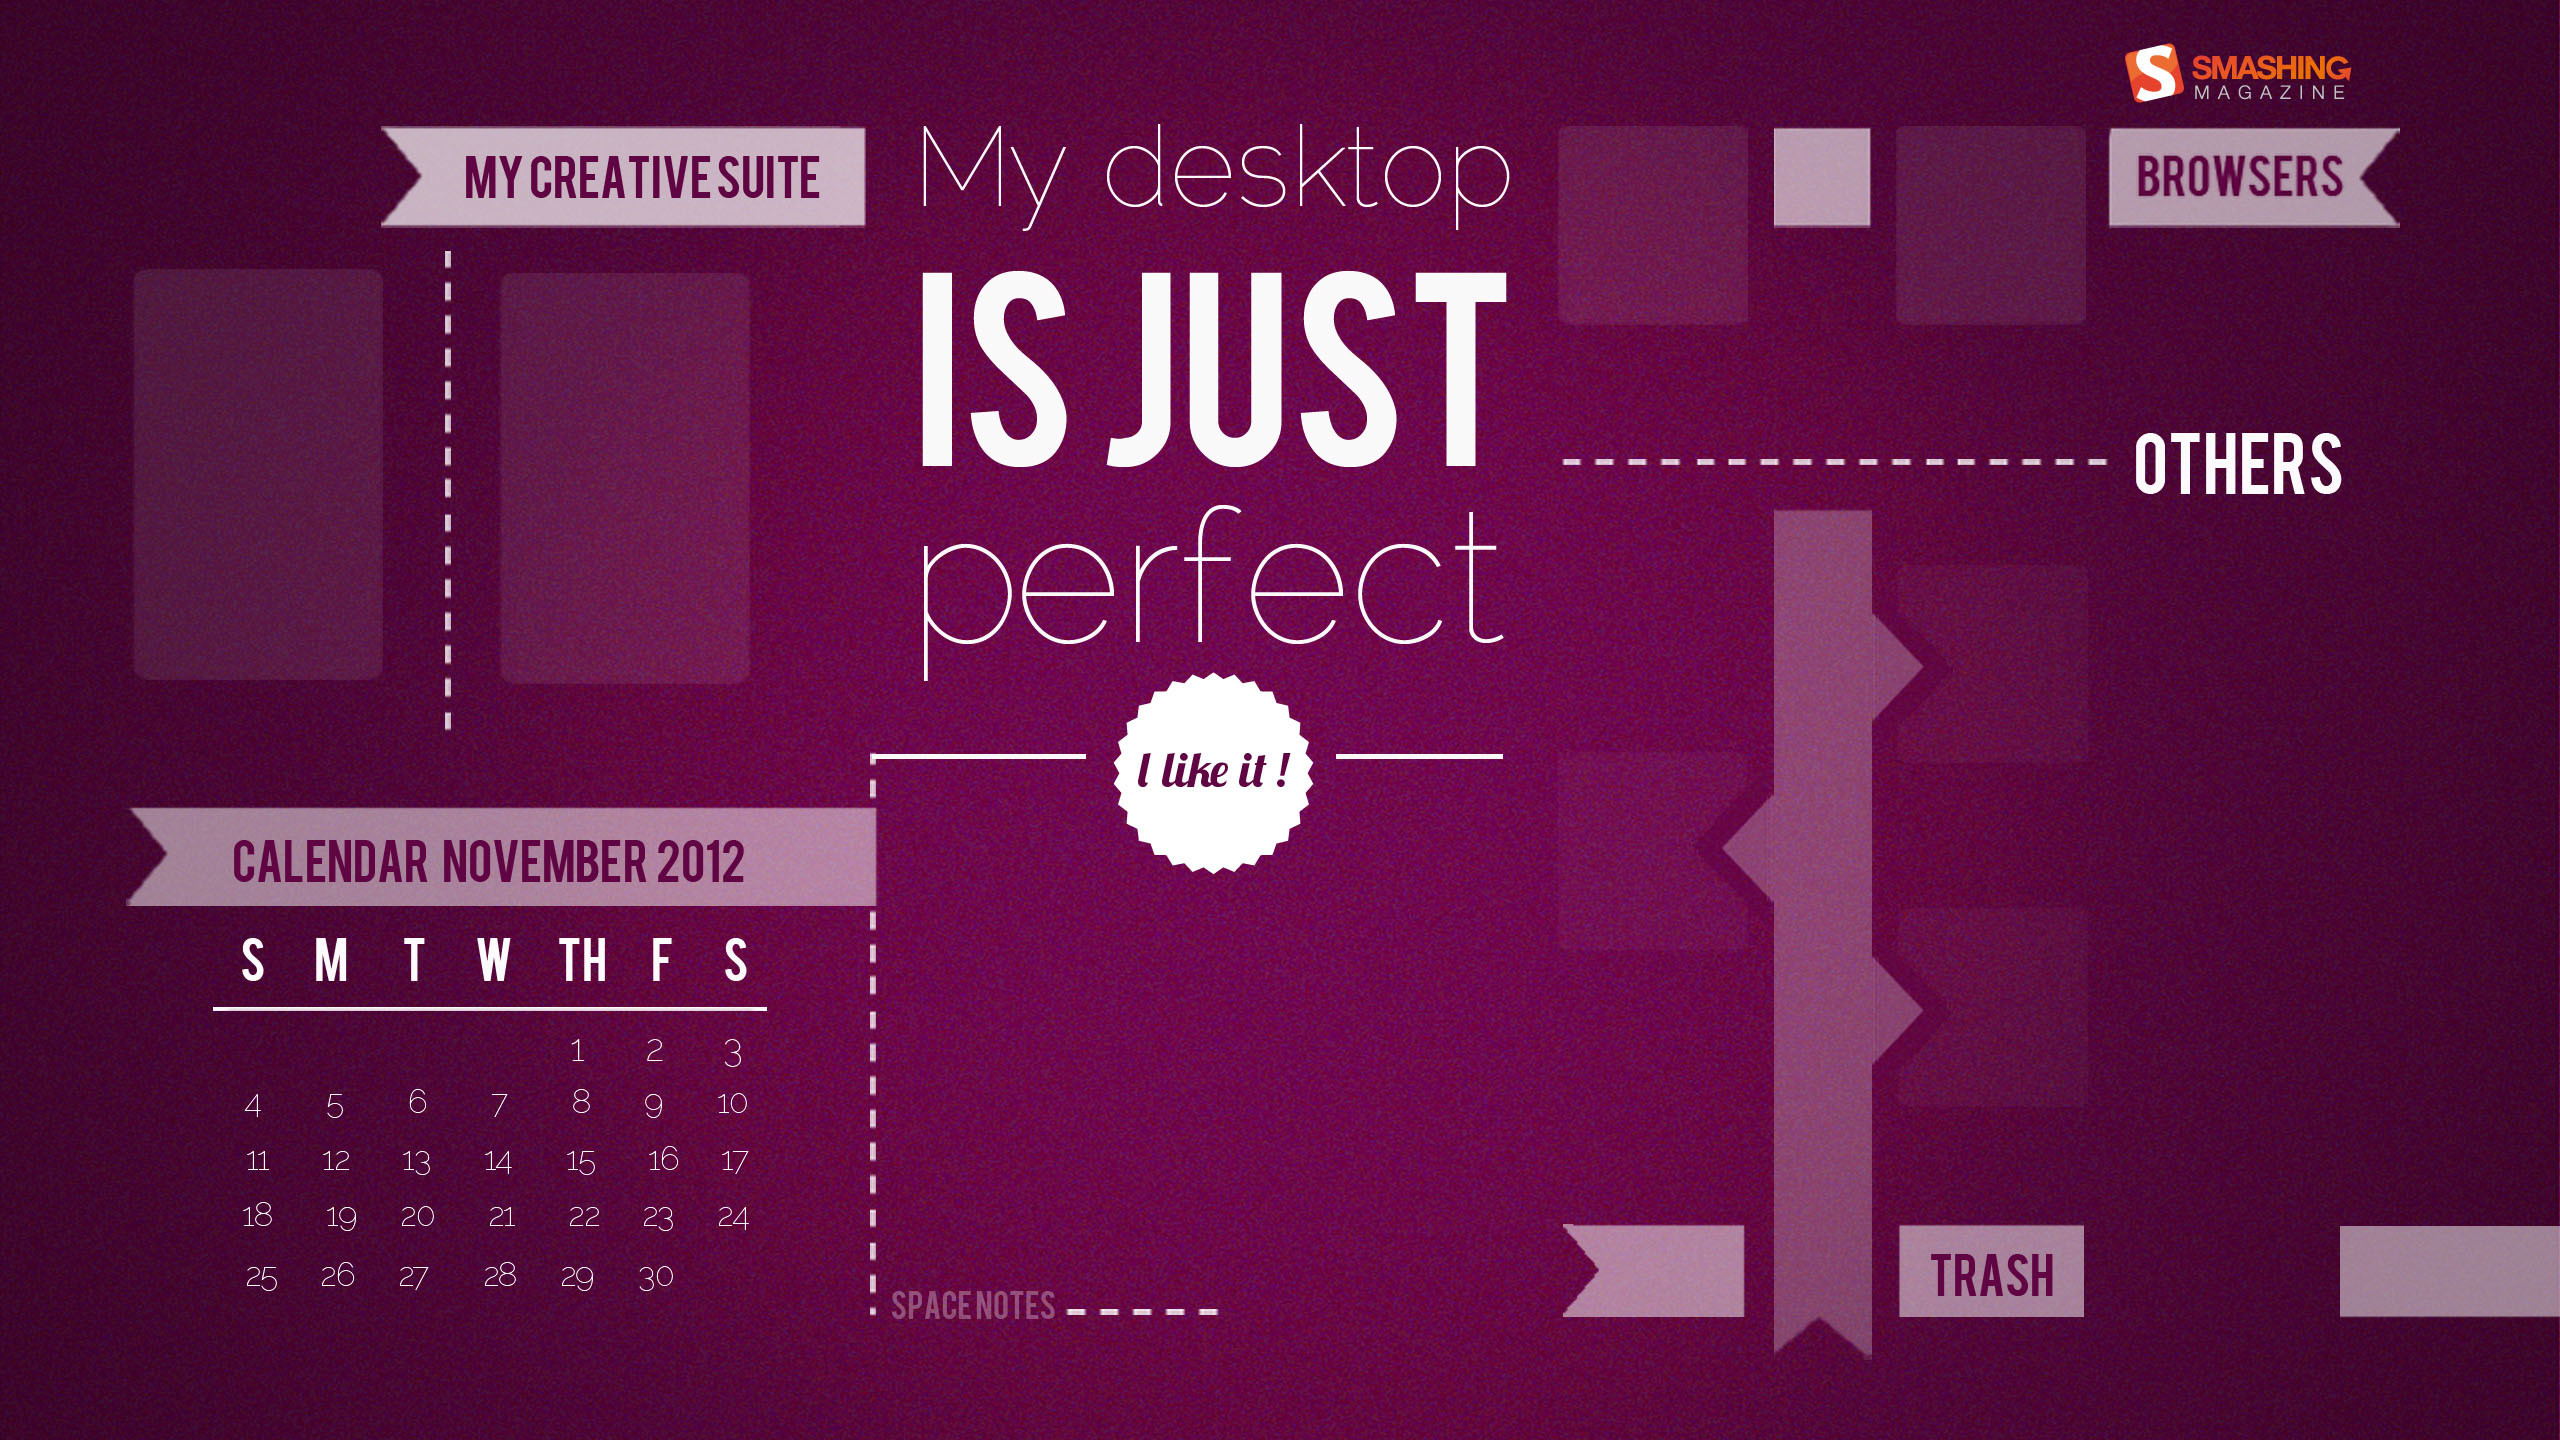 Windows HD desktop wallpaper High Definition Fullscreen Mobile .